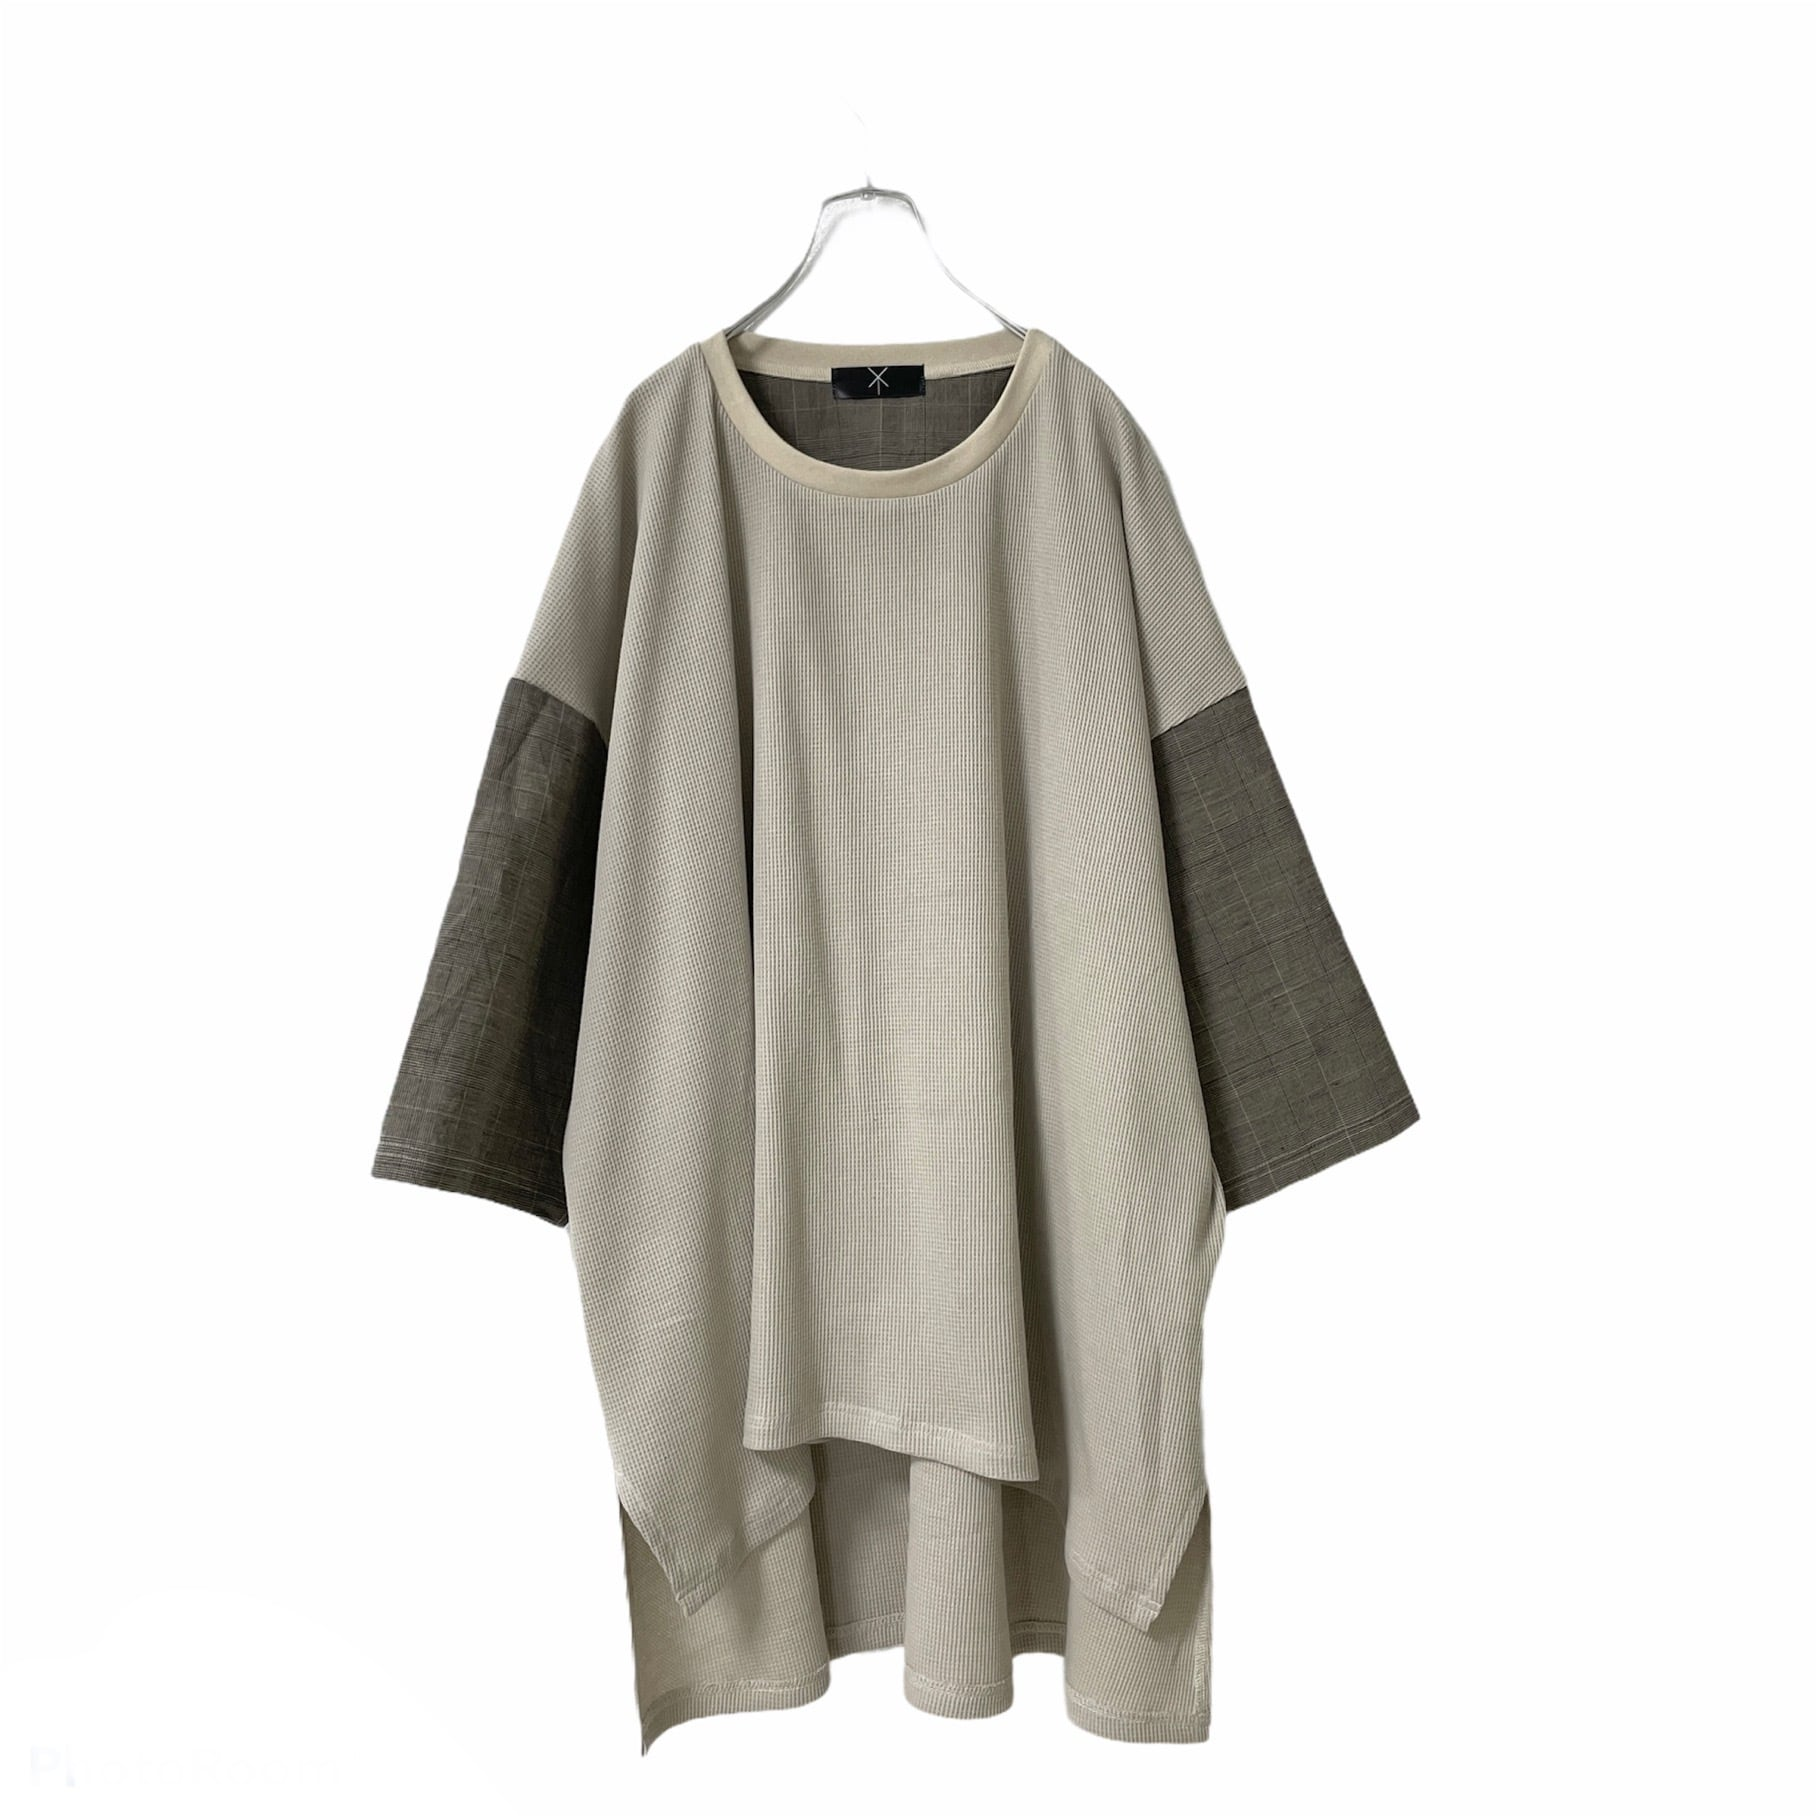 Slit-T-shirts1.2 (light beige/brown)